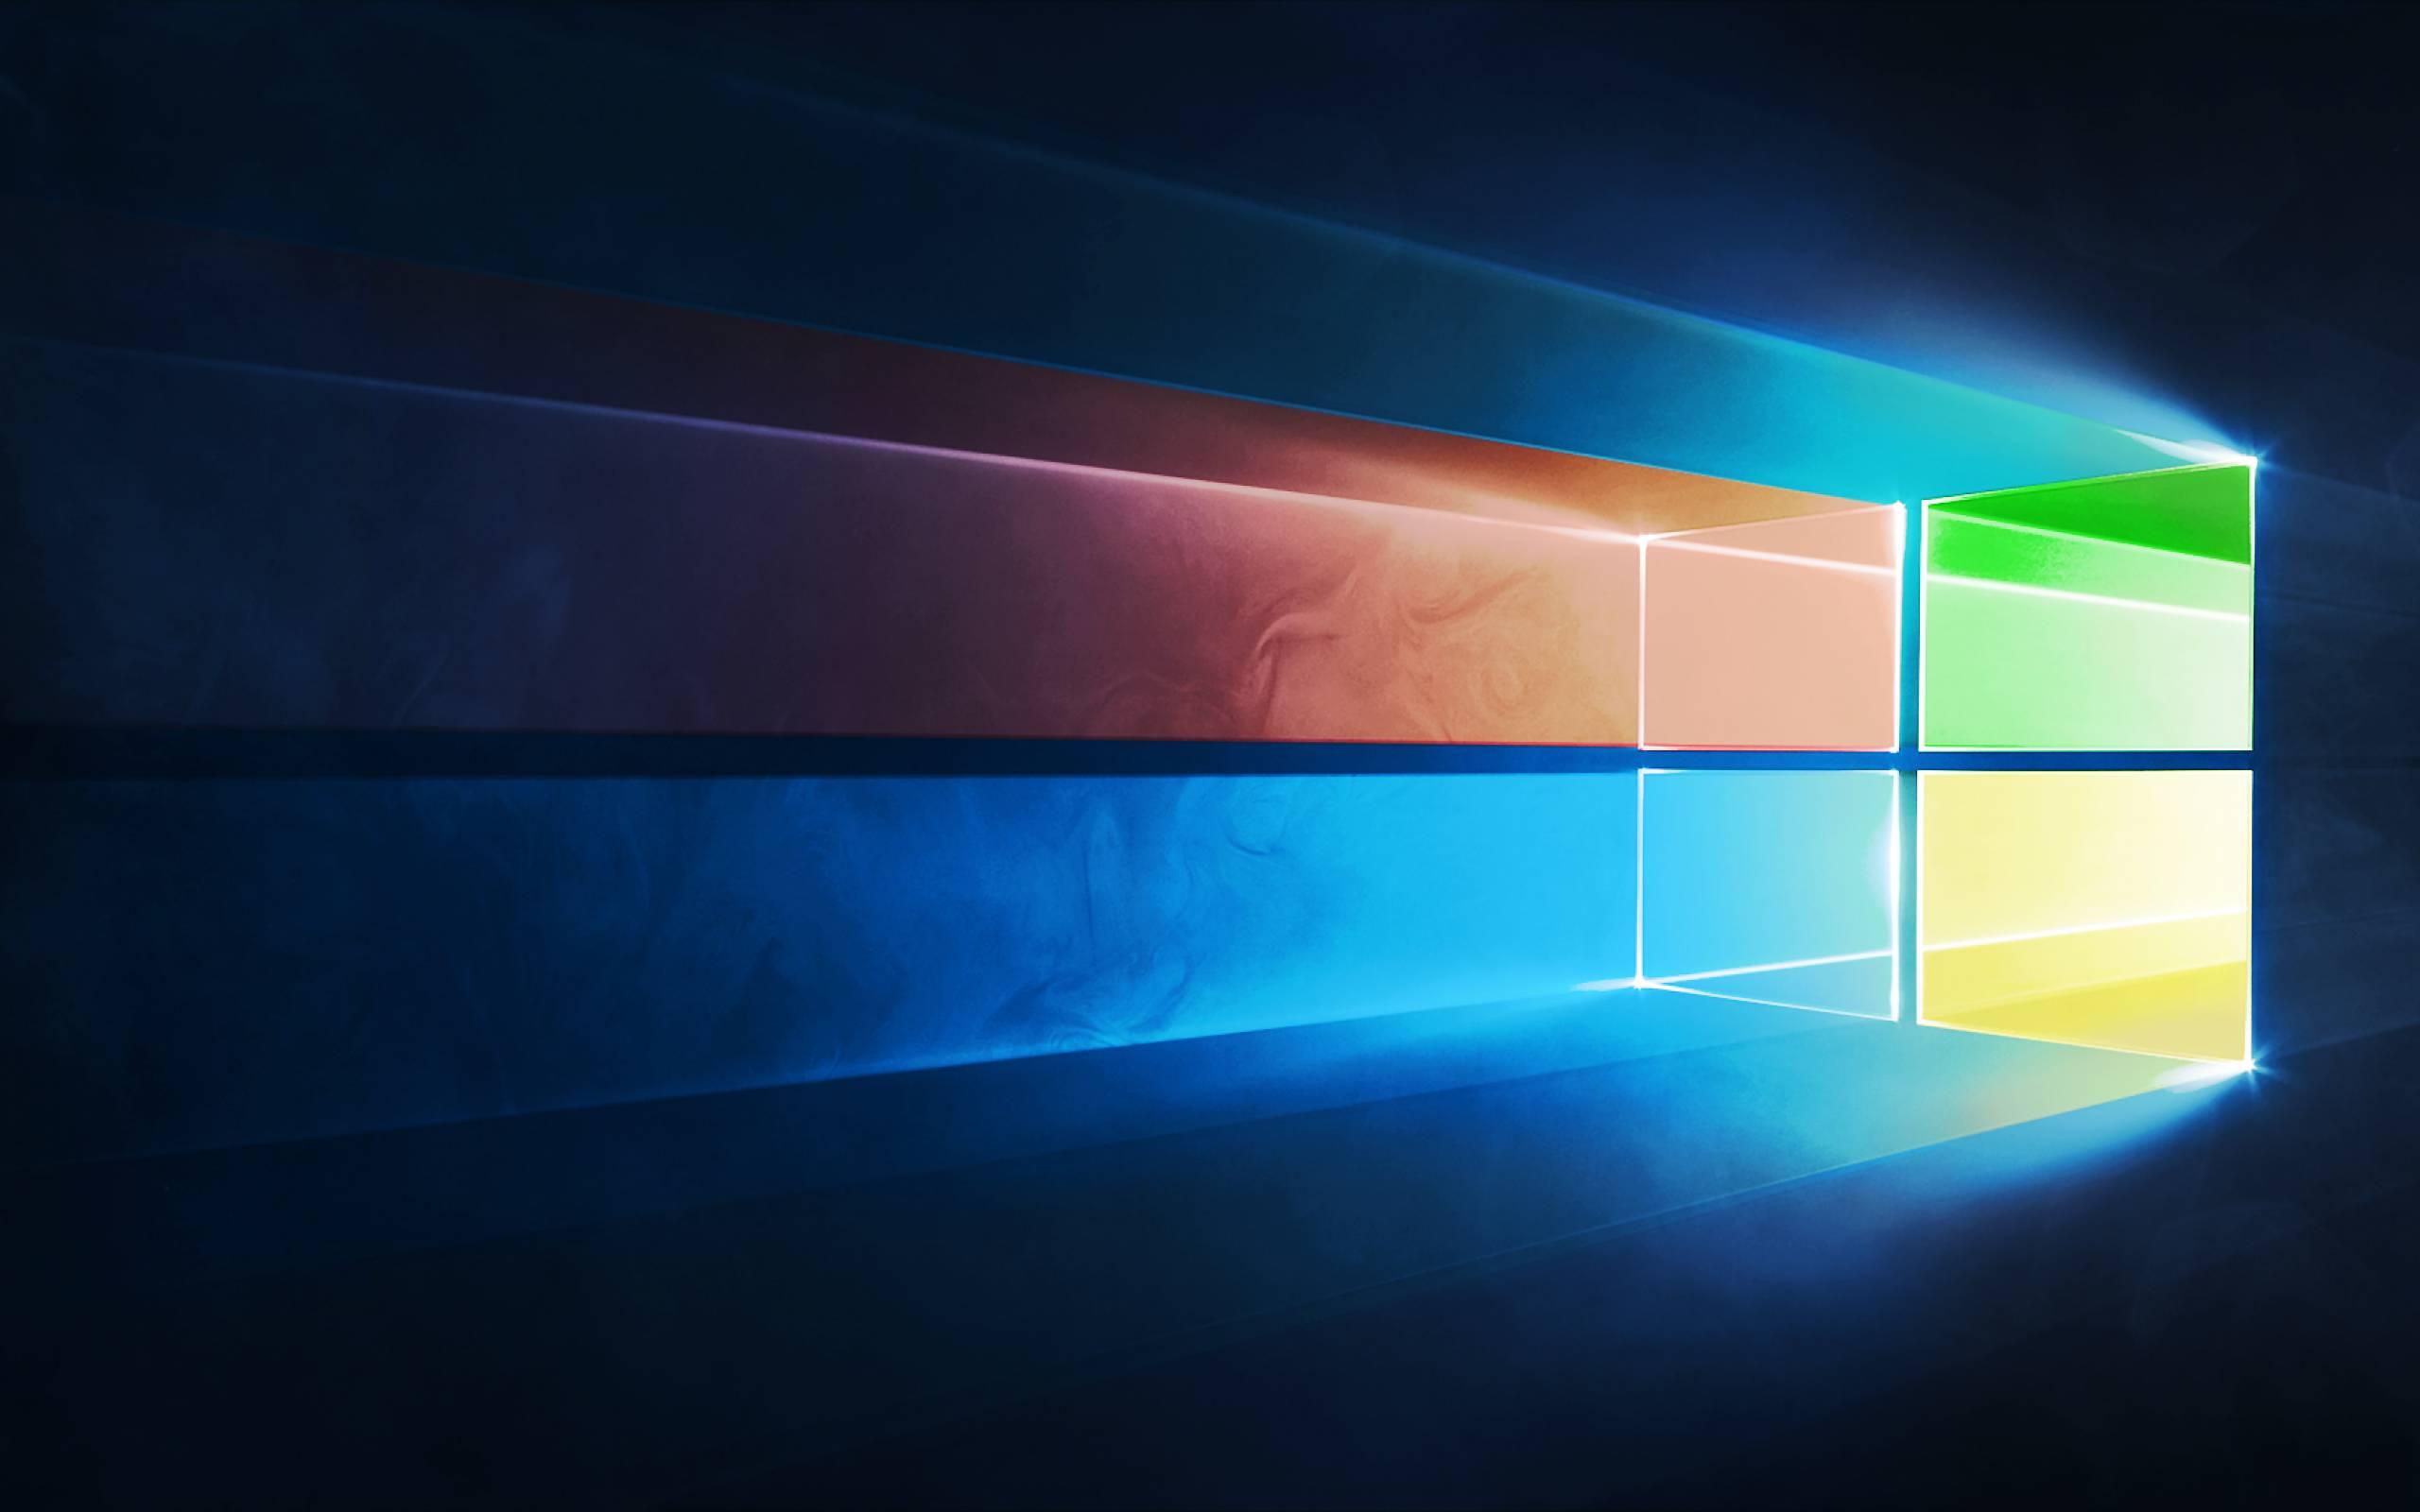 Windows-10-HD-Wallpaper-33